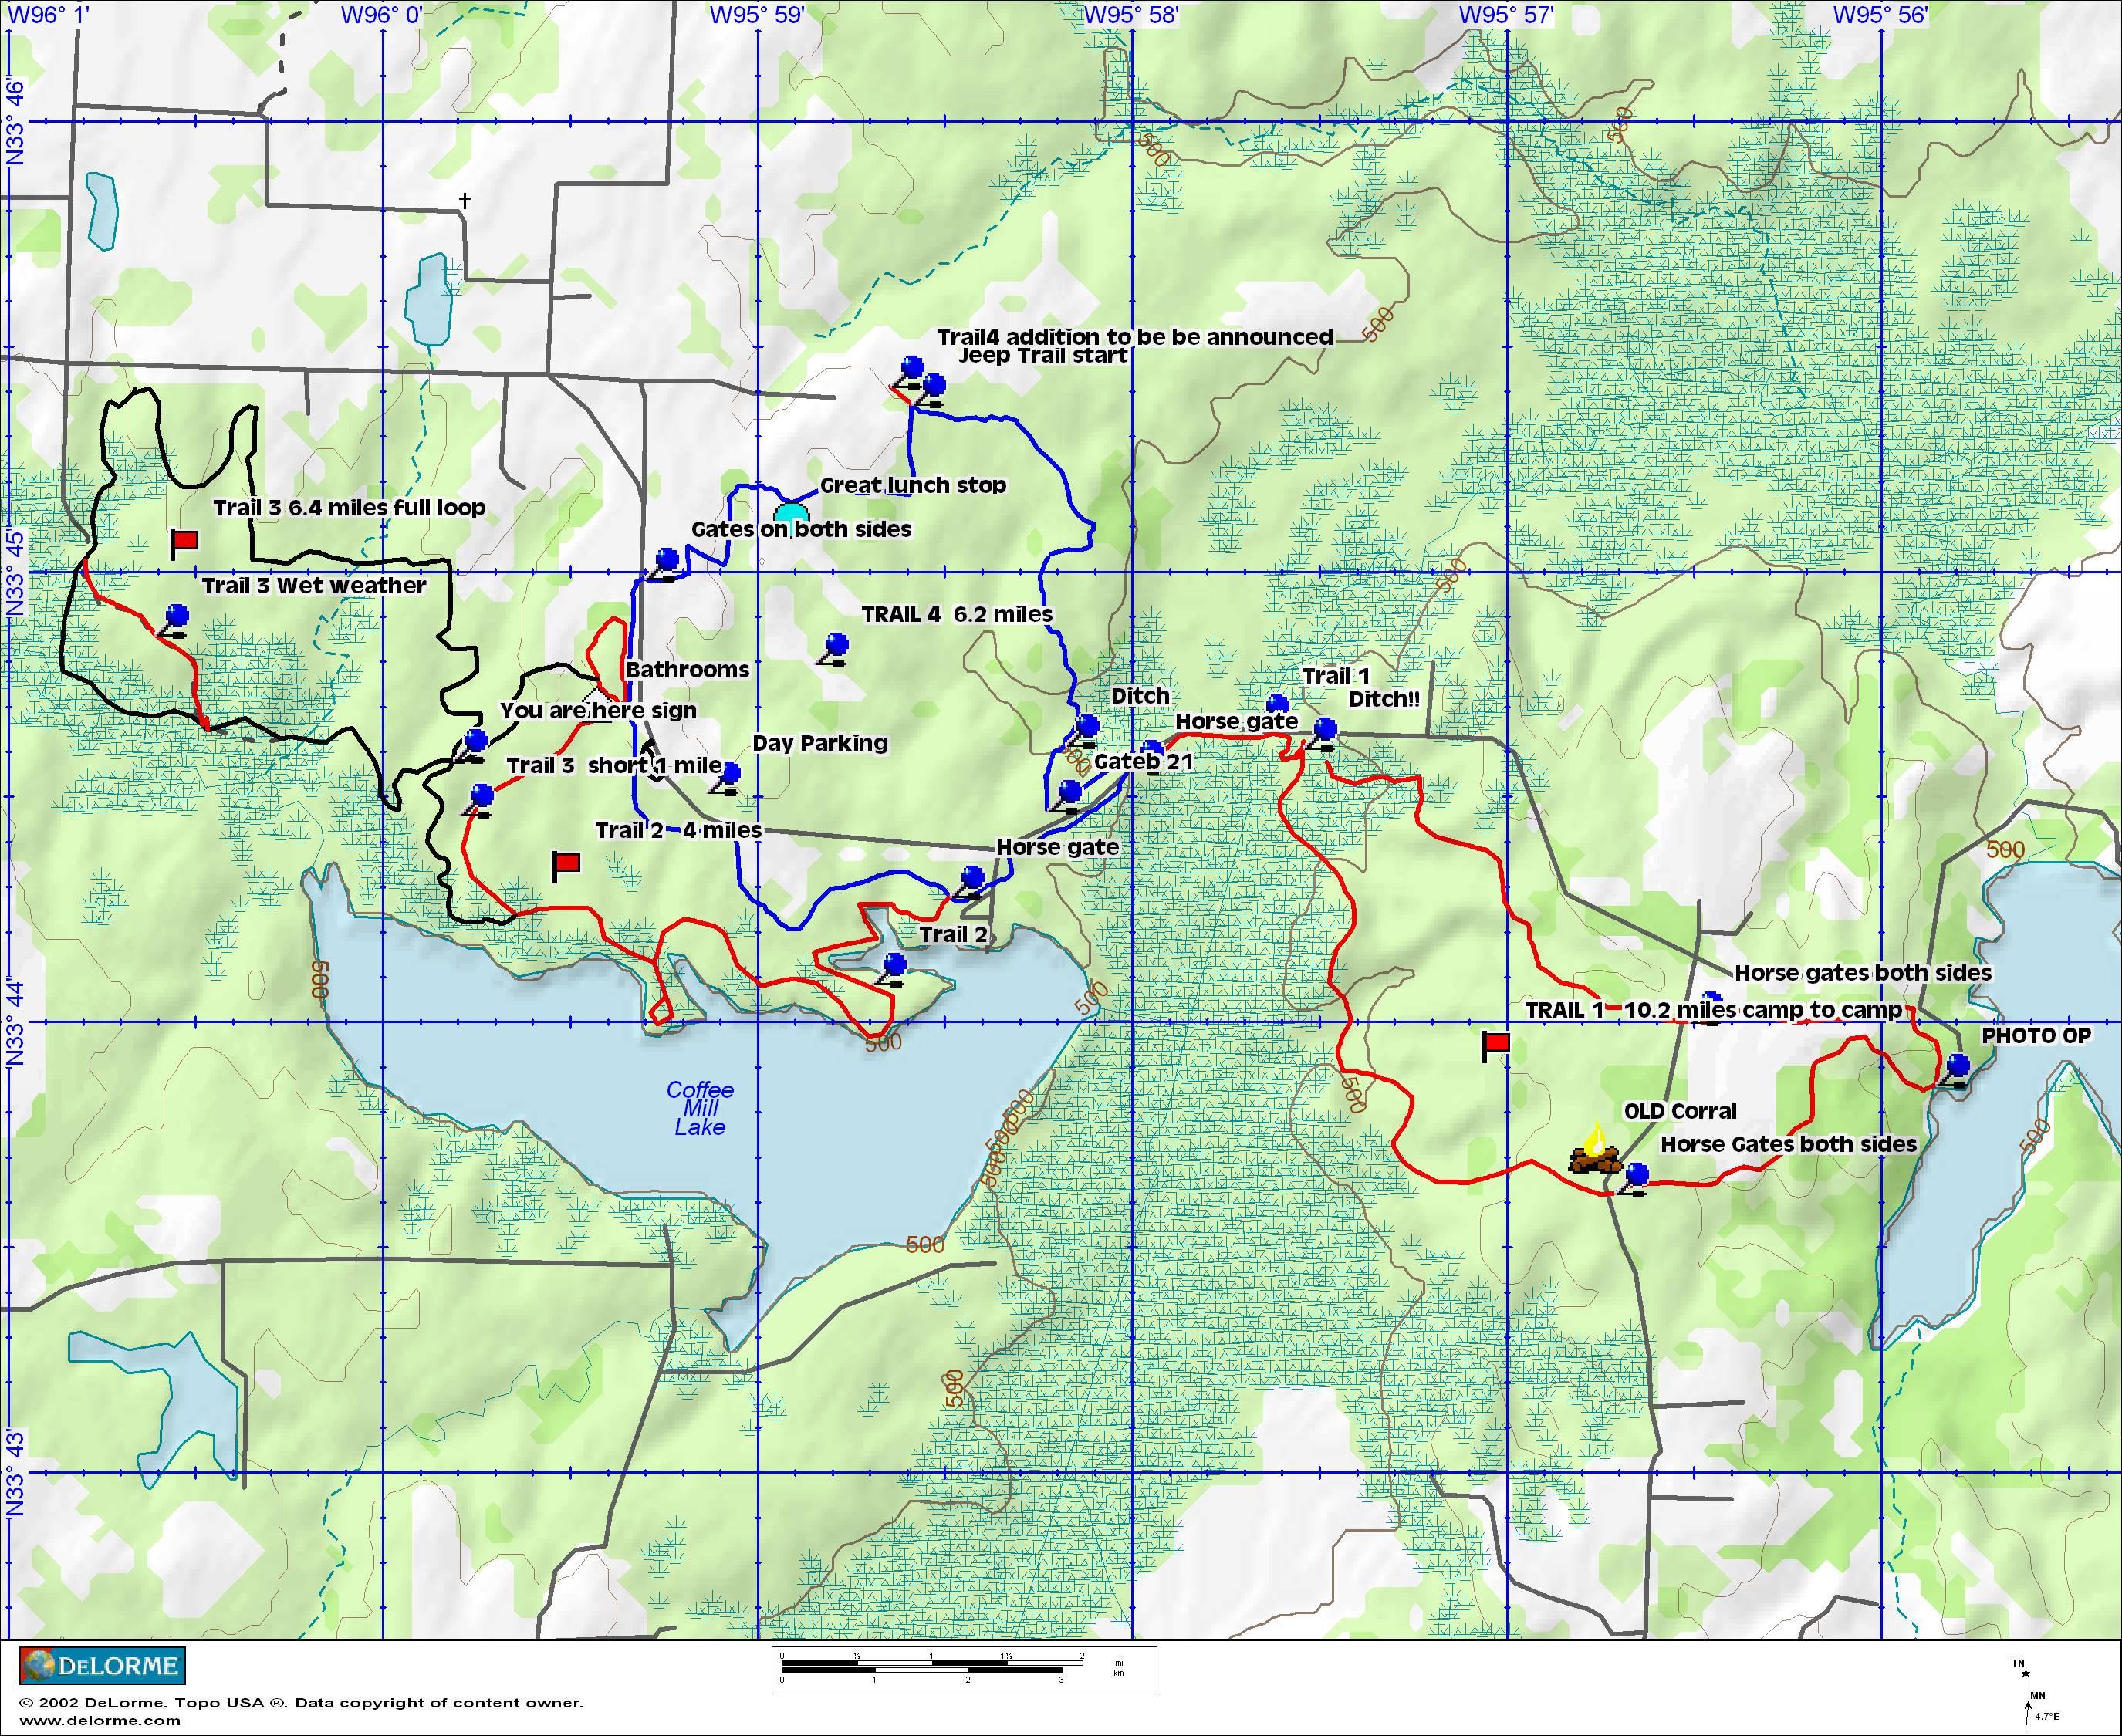 Equestrian Trails - Texas Wma Map